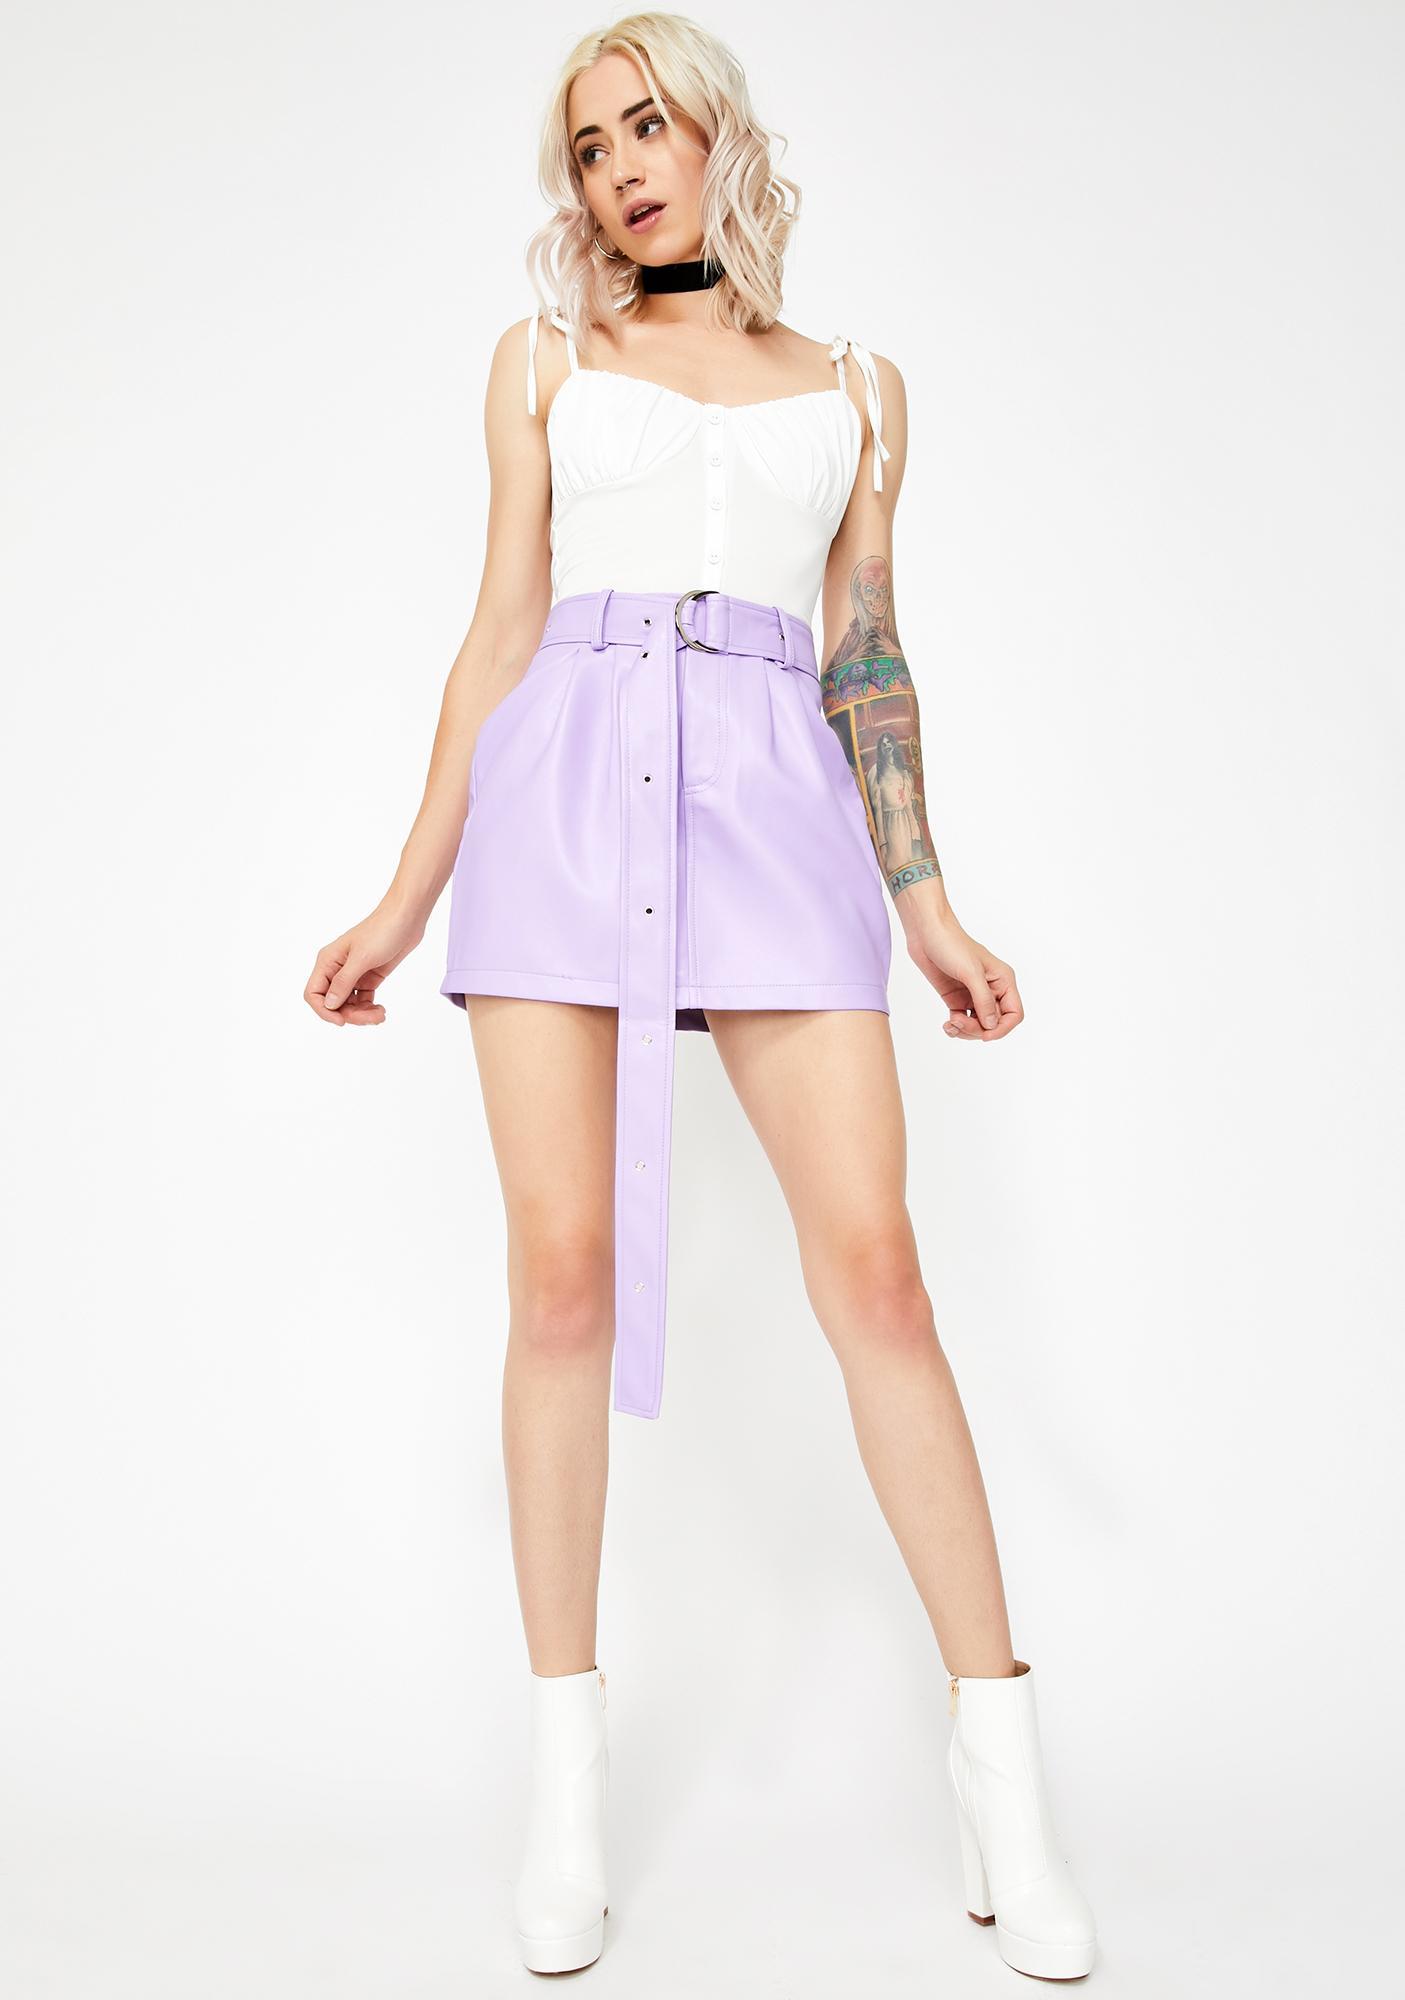 Kiki Riki White Feelin' Femme Bustier Top